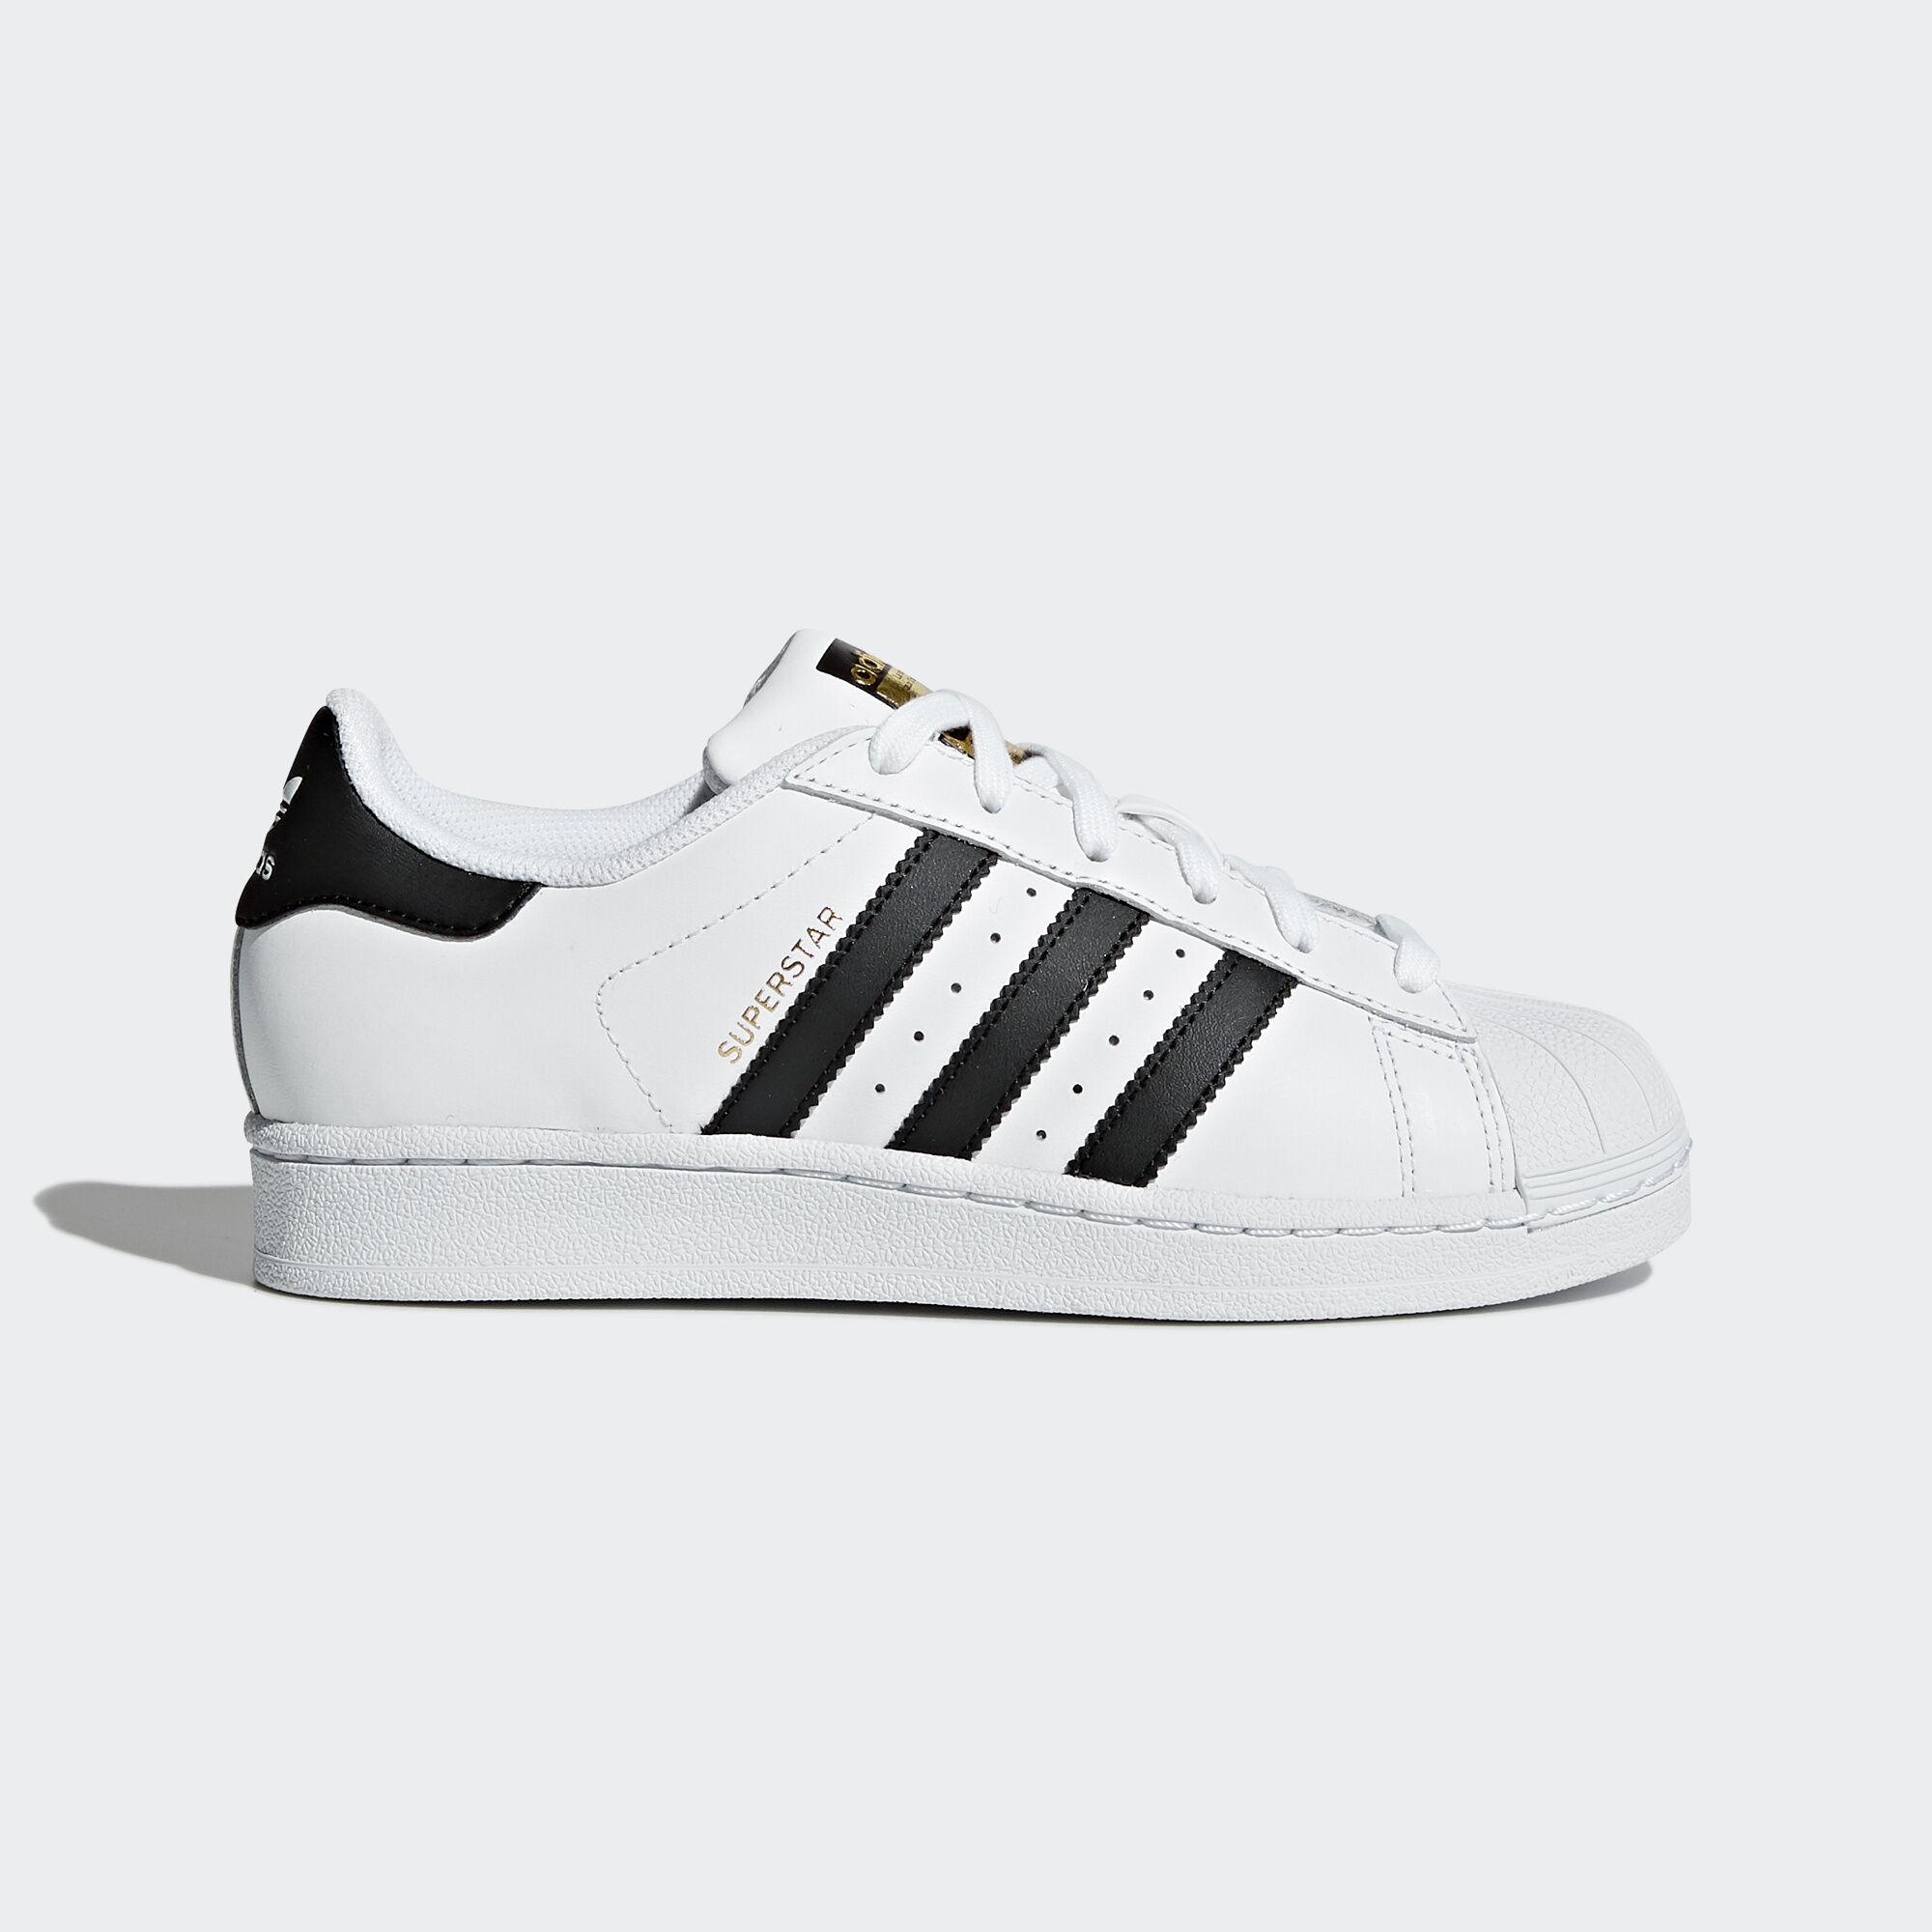 cc5b0bd696c Adidas Sneakers Wit Hoog brabantbreedband.nl